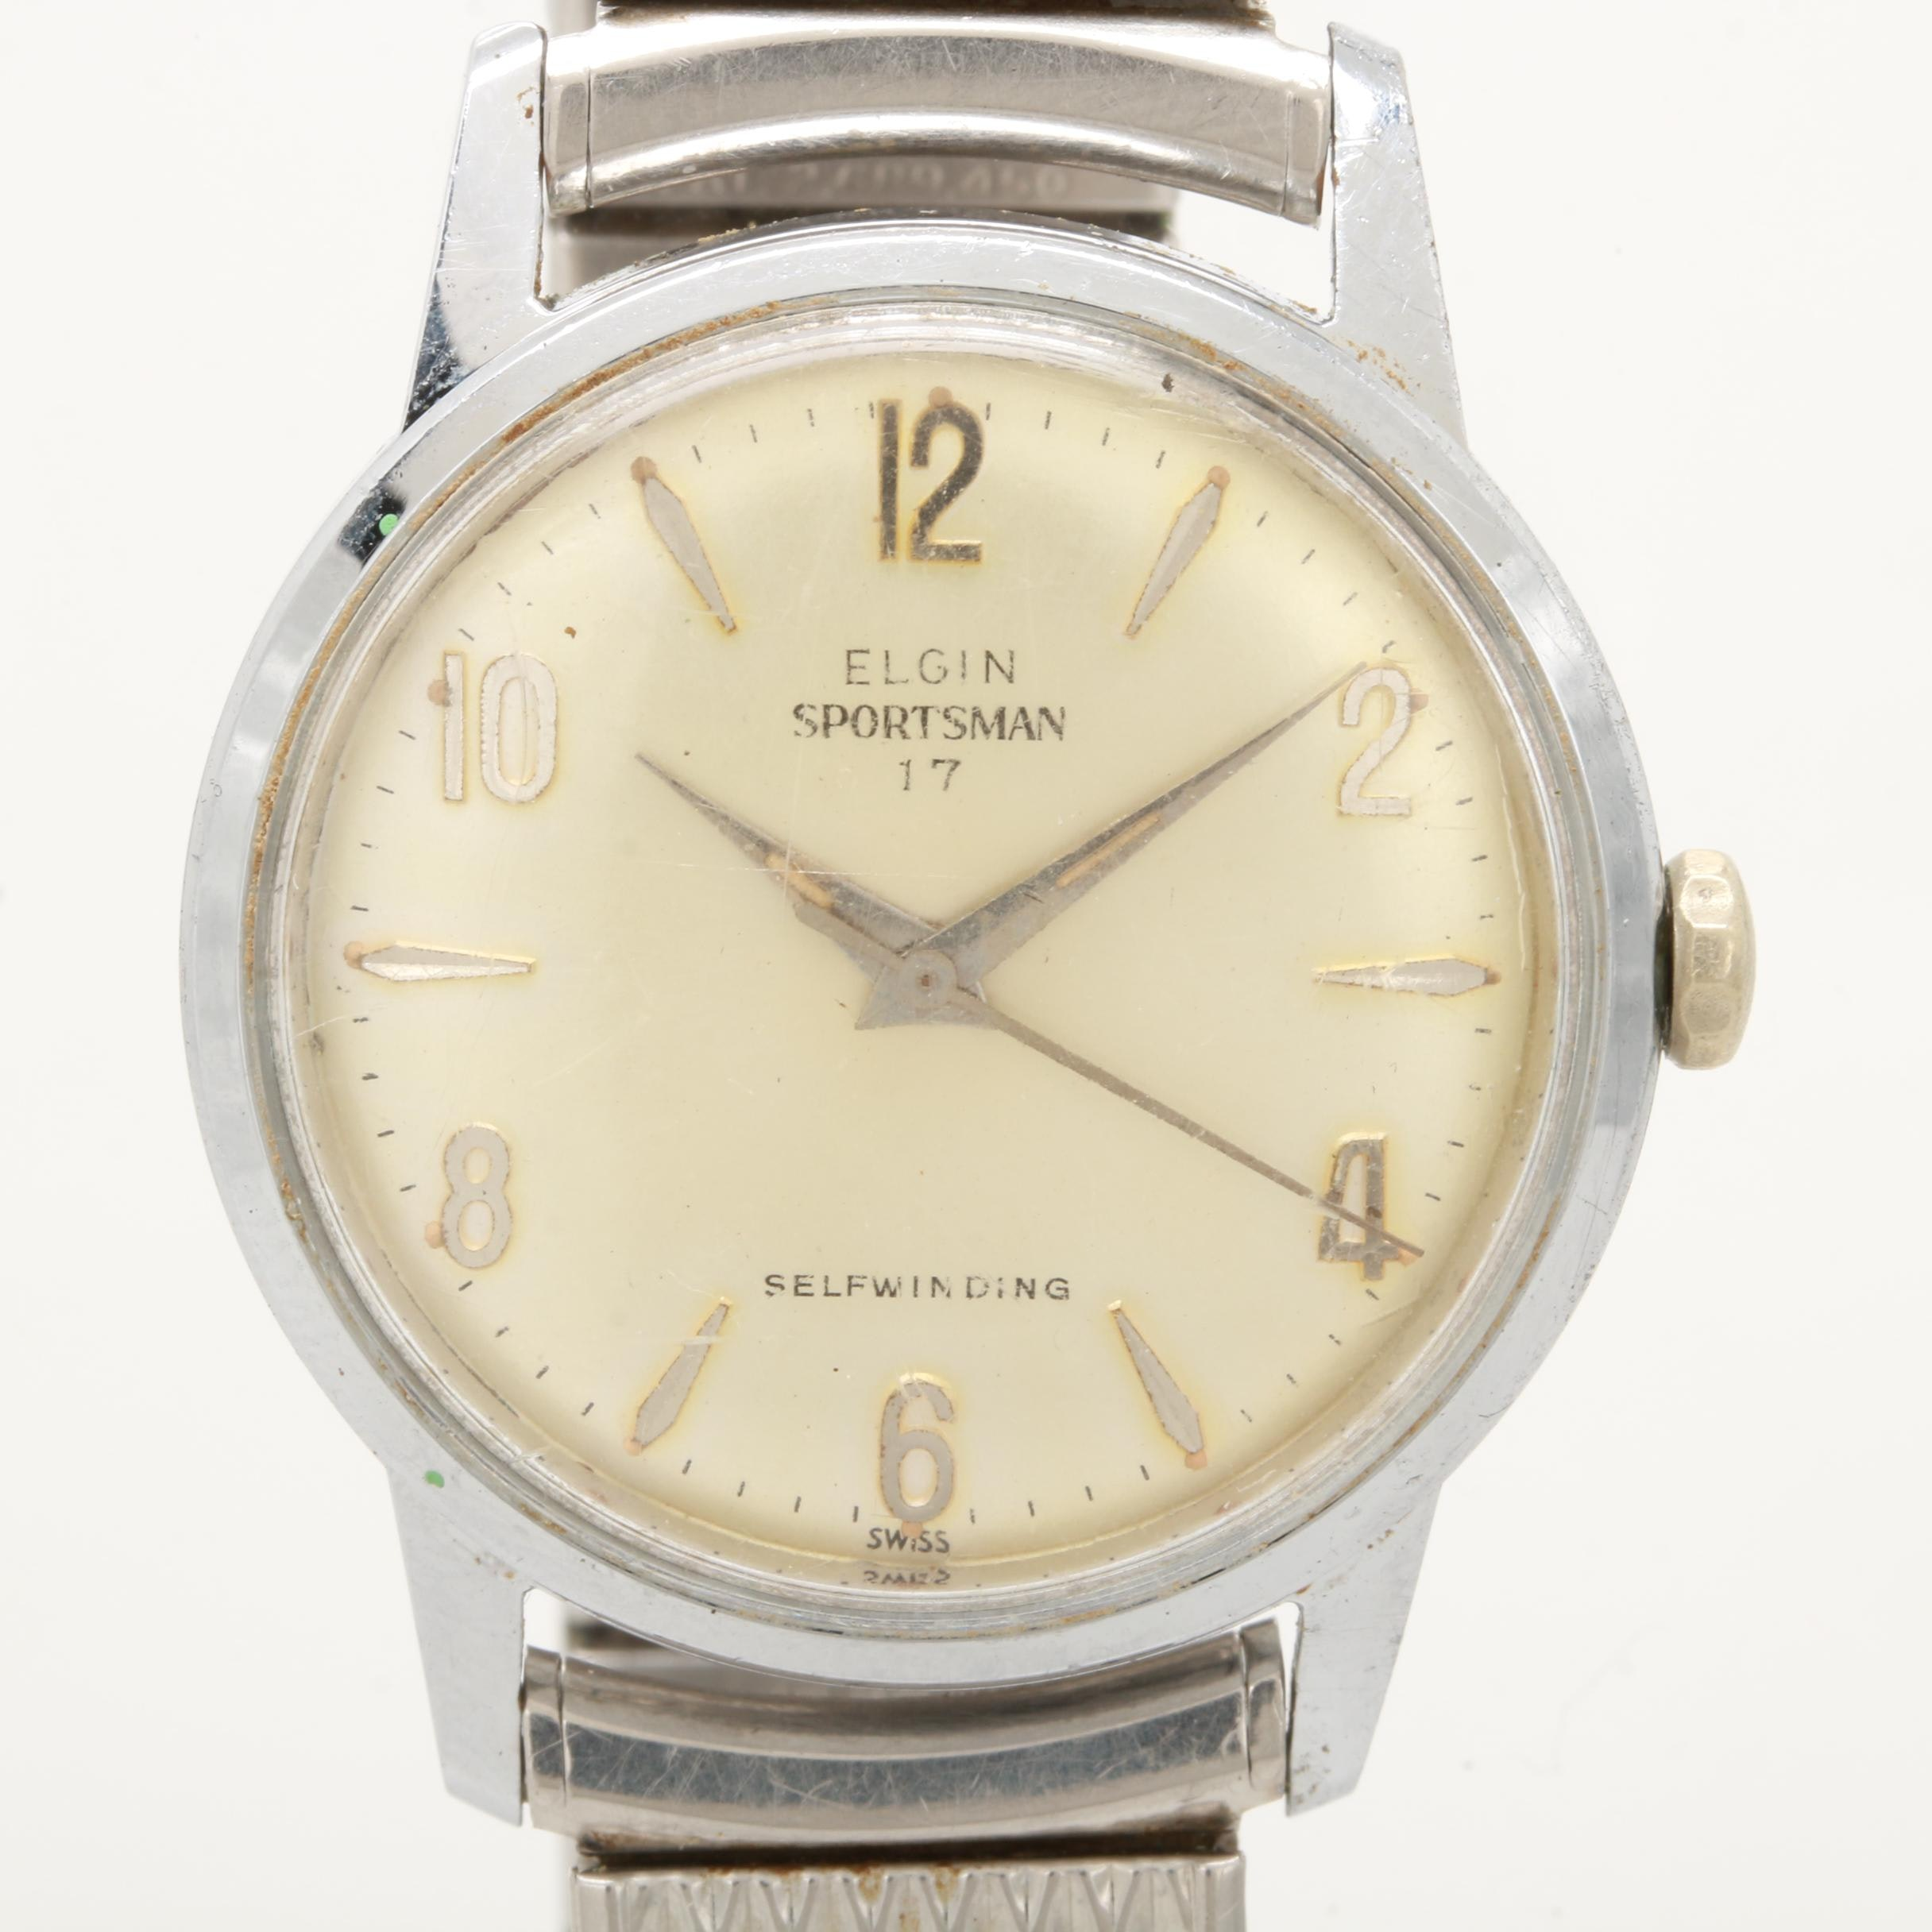 "Elgin ""Sportsman"" Automatic Wristwatch"